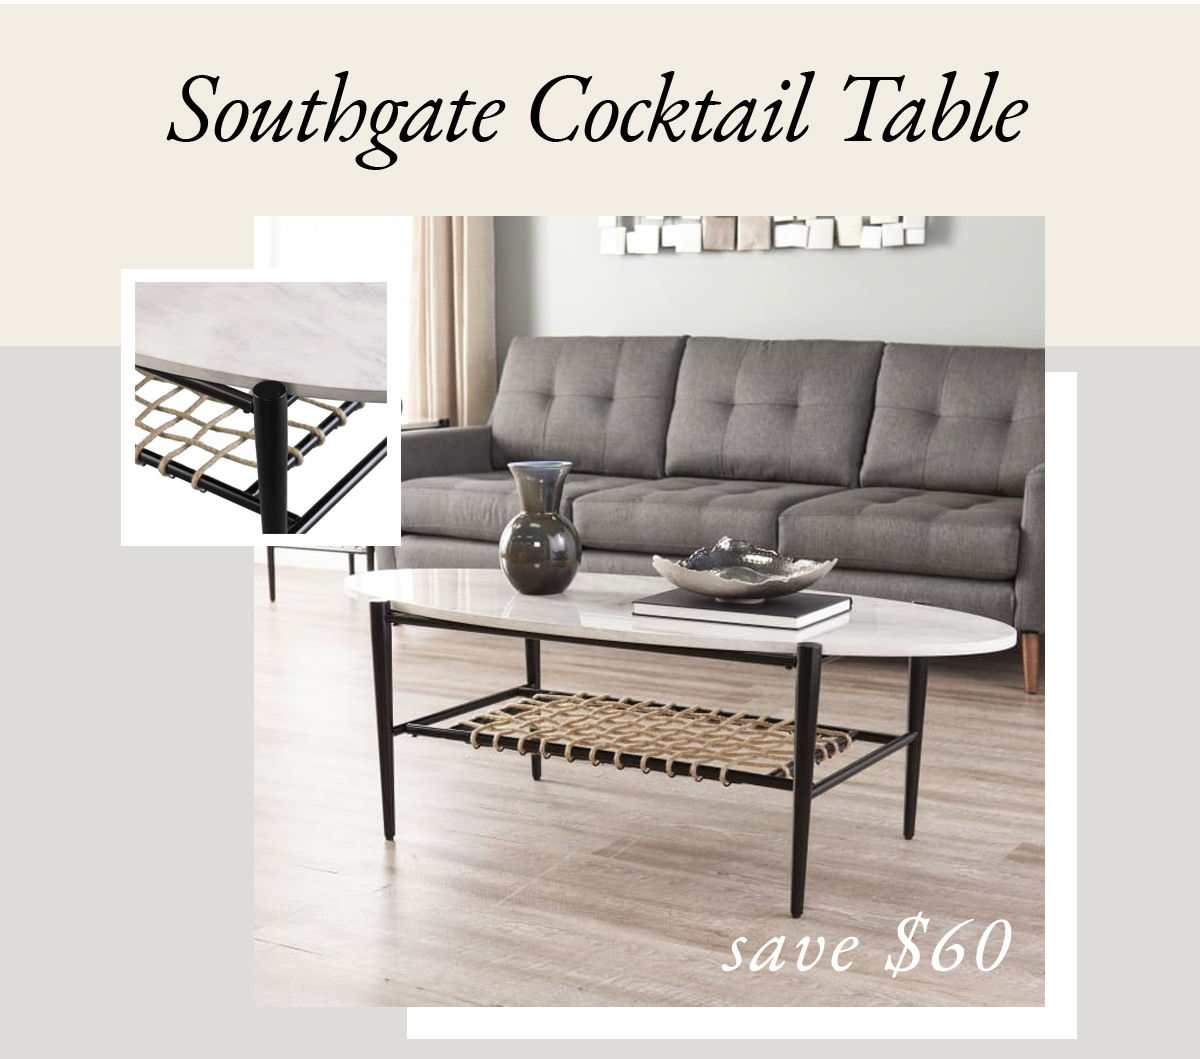 Southgate Cocktail Table | SHOP NOW